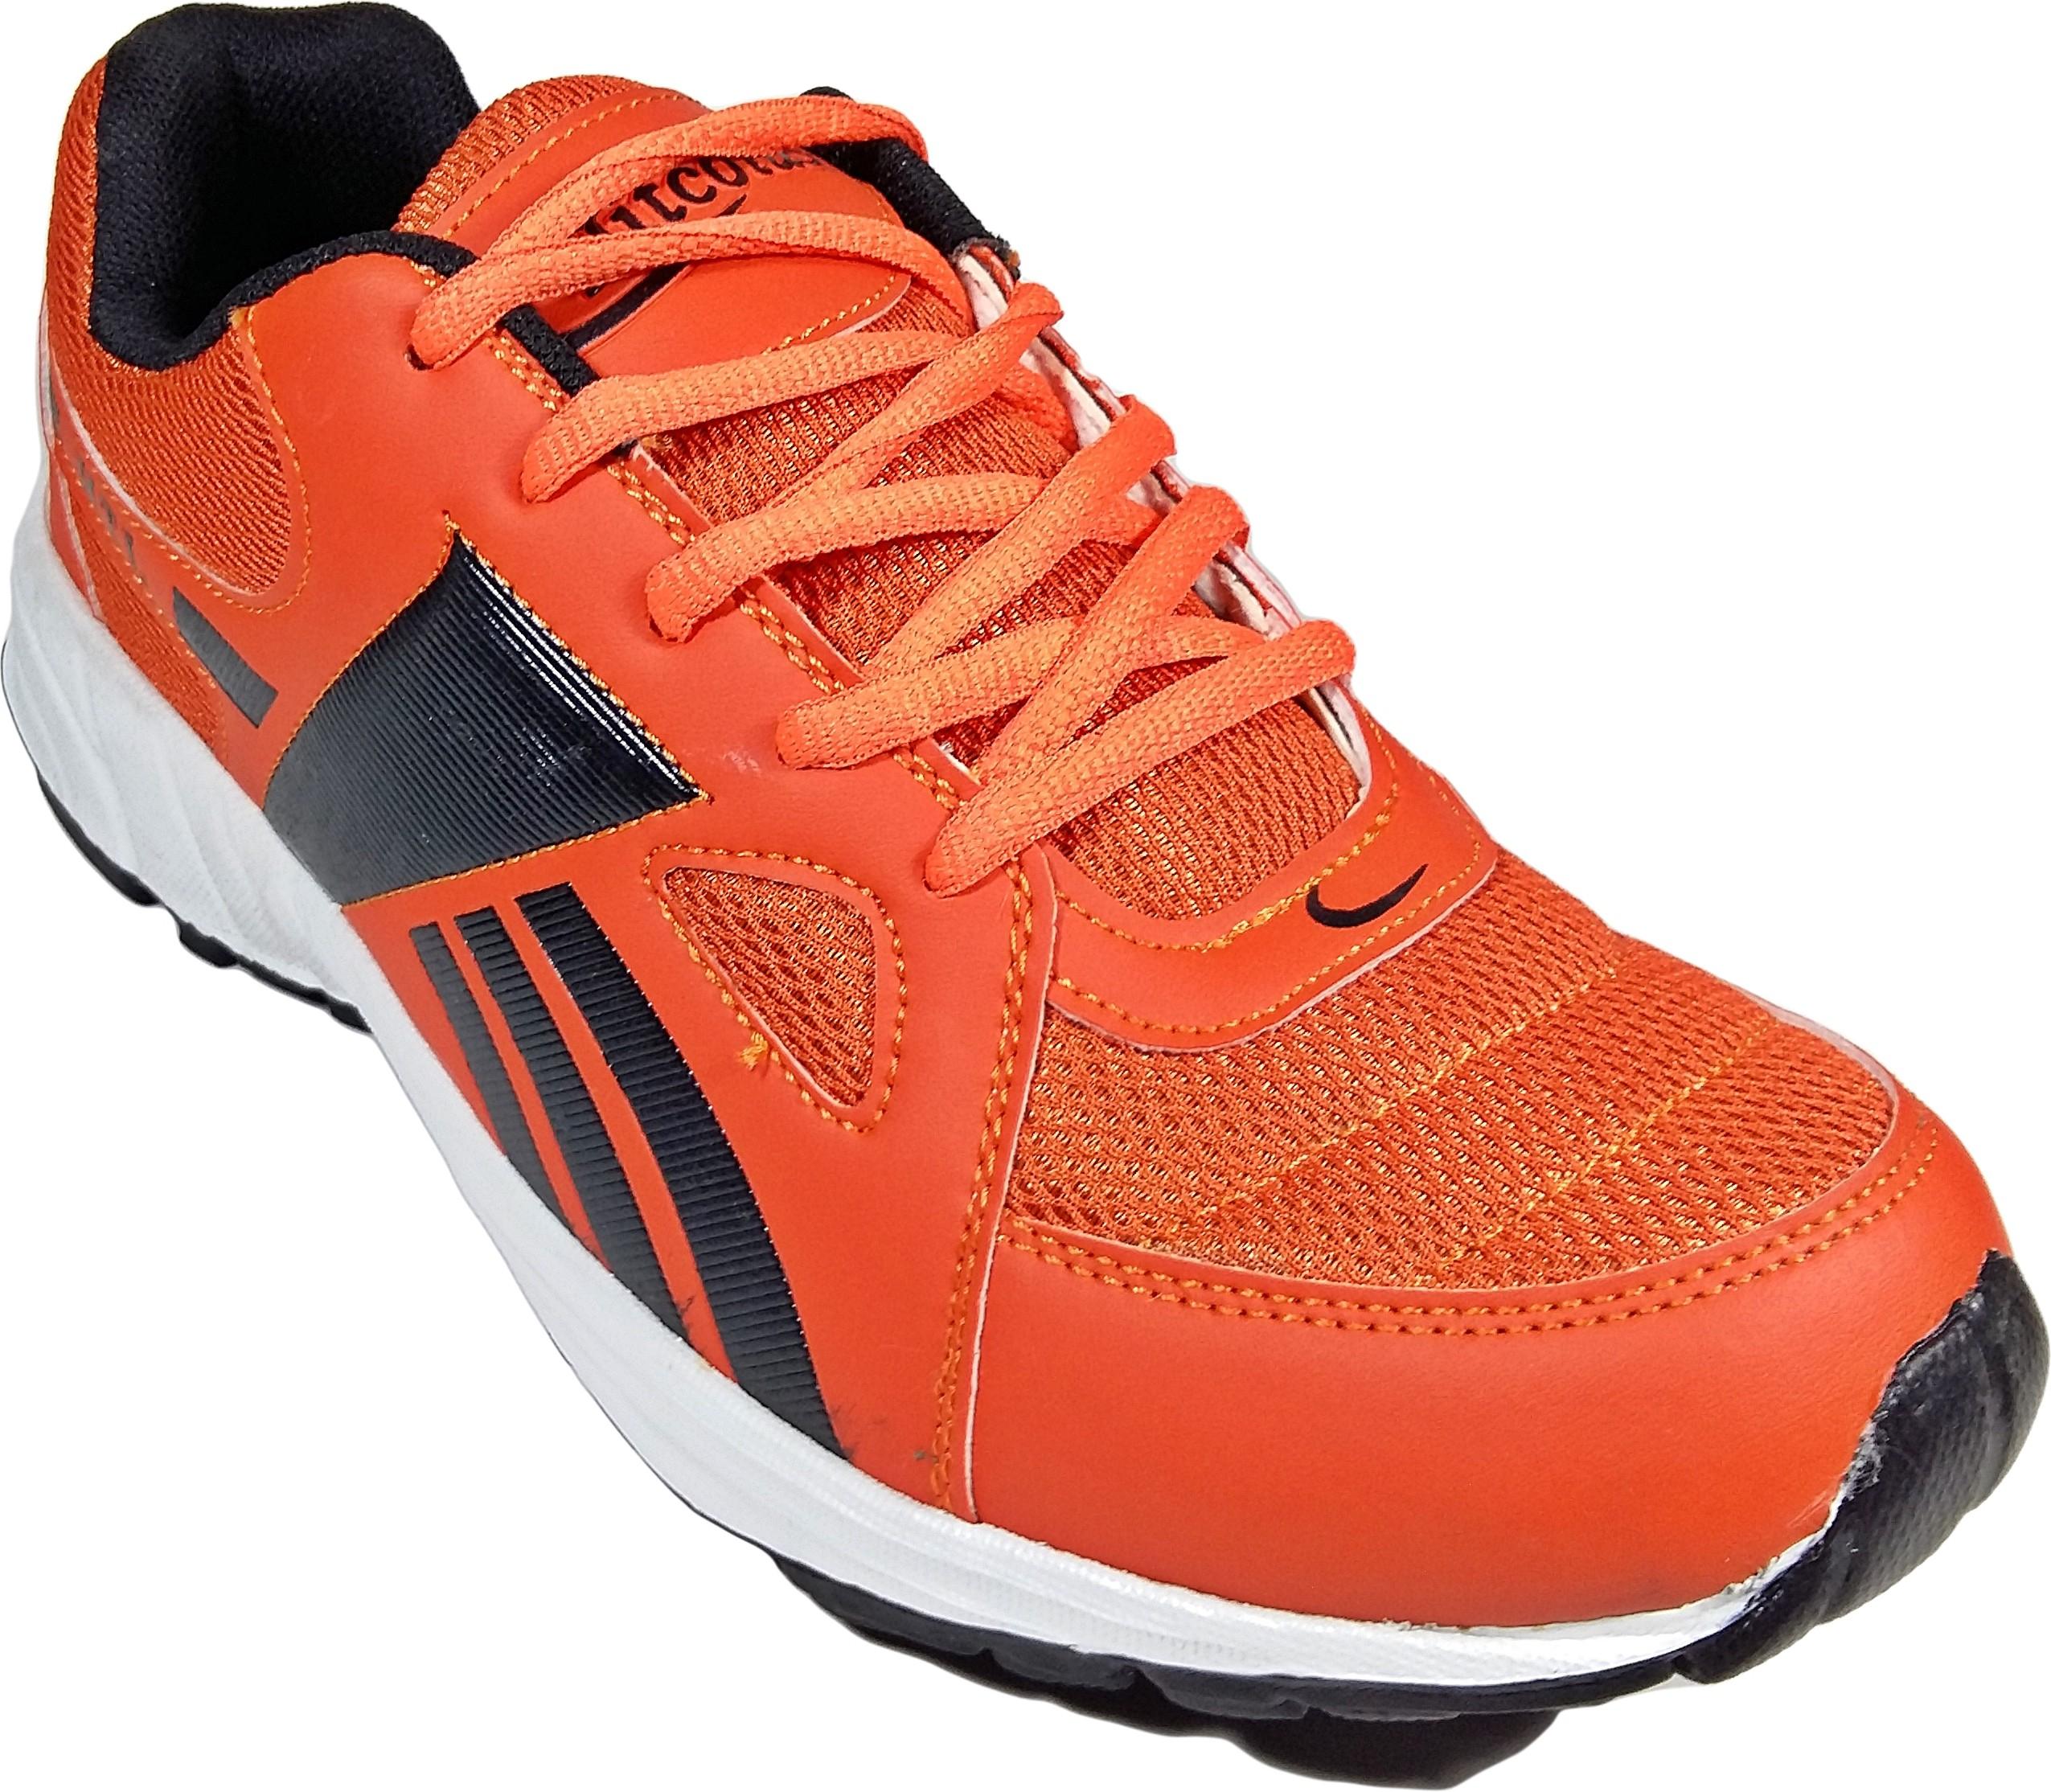 WBH Htl Orange Black Running Shoes